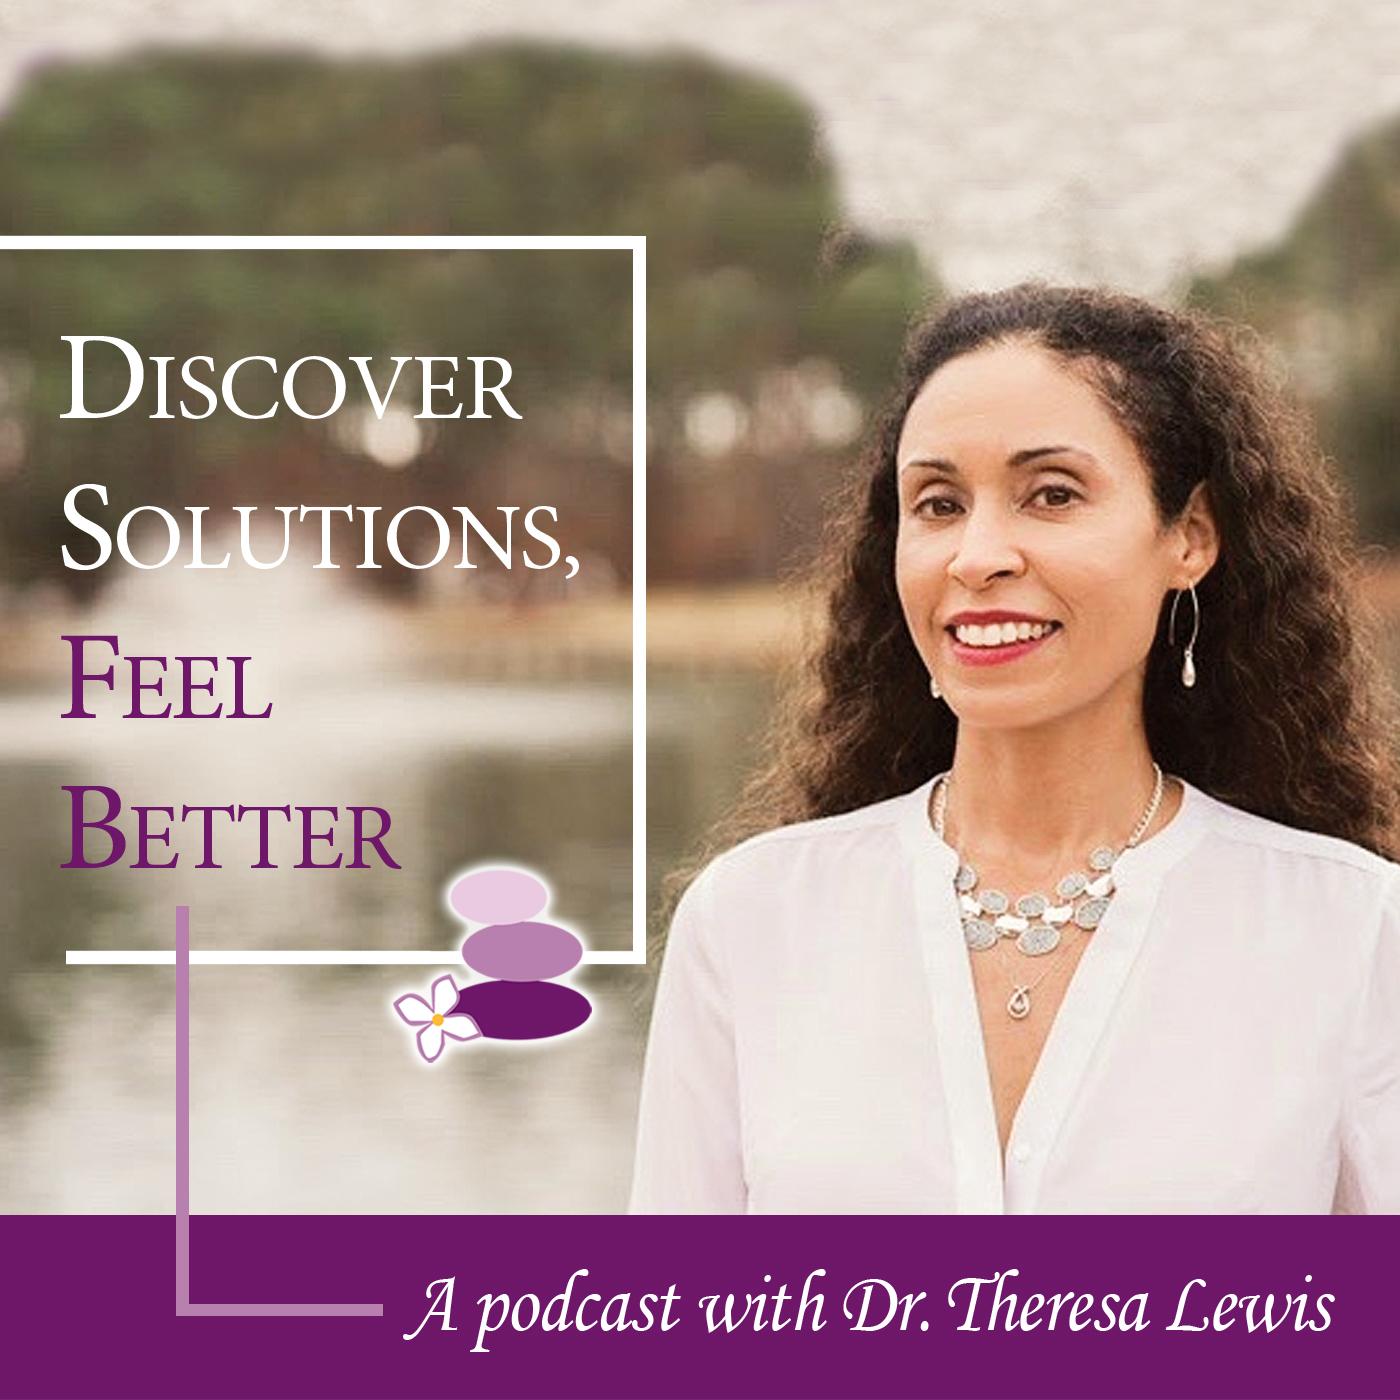 Ep 8: Don't Let Stigma Stop You